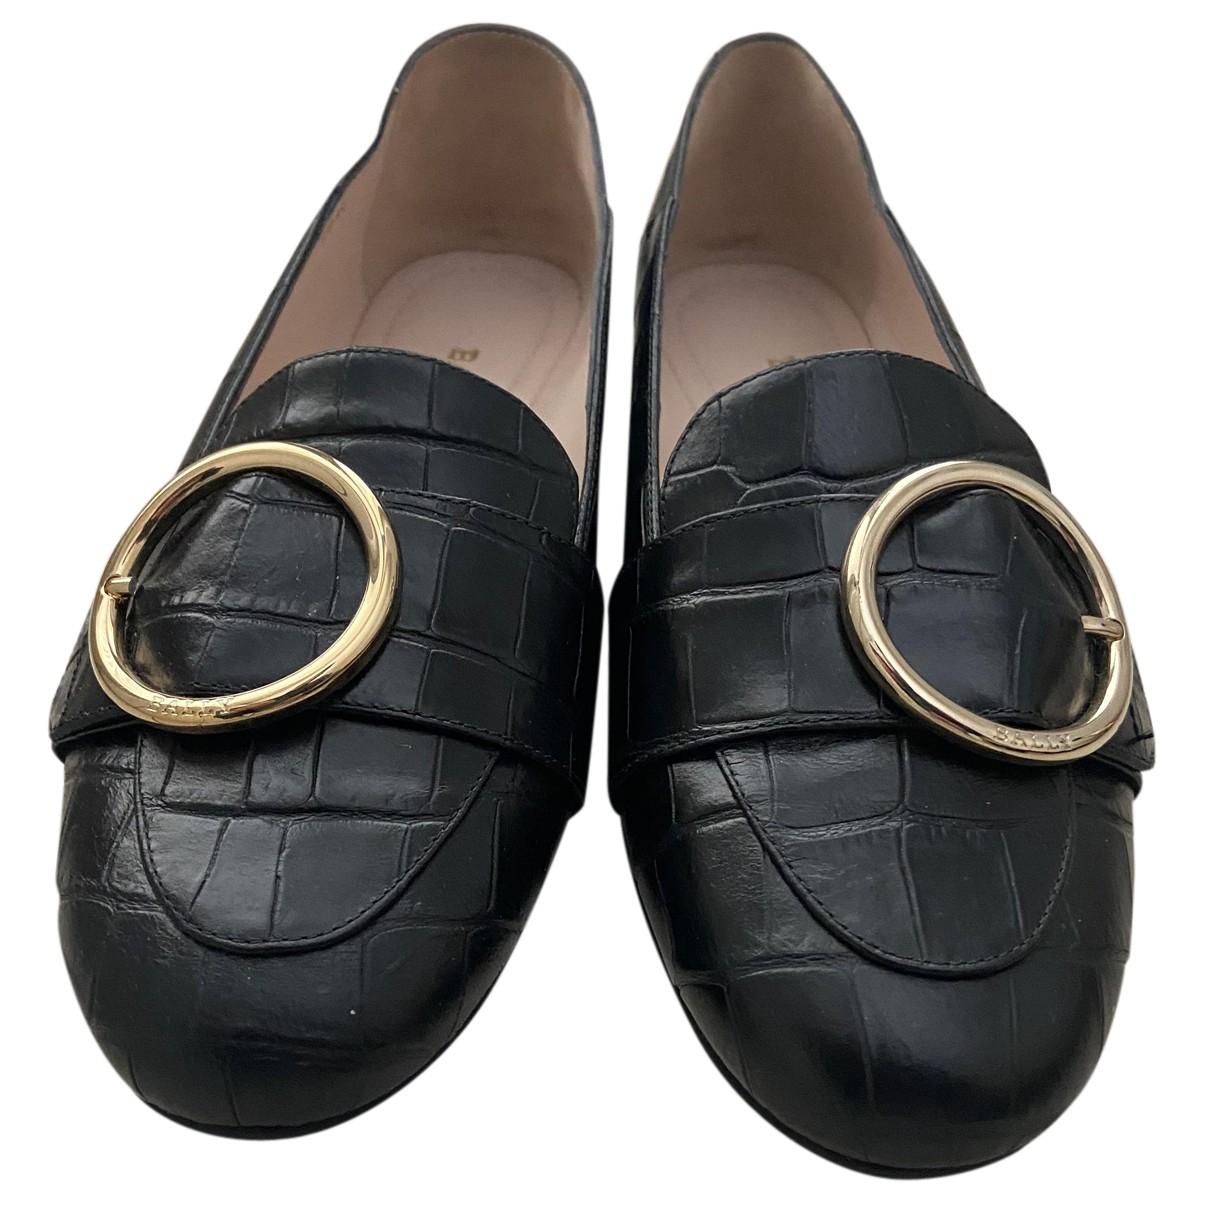 Bally - Ballerines   pour femme en cuir - noir